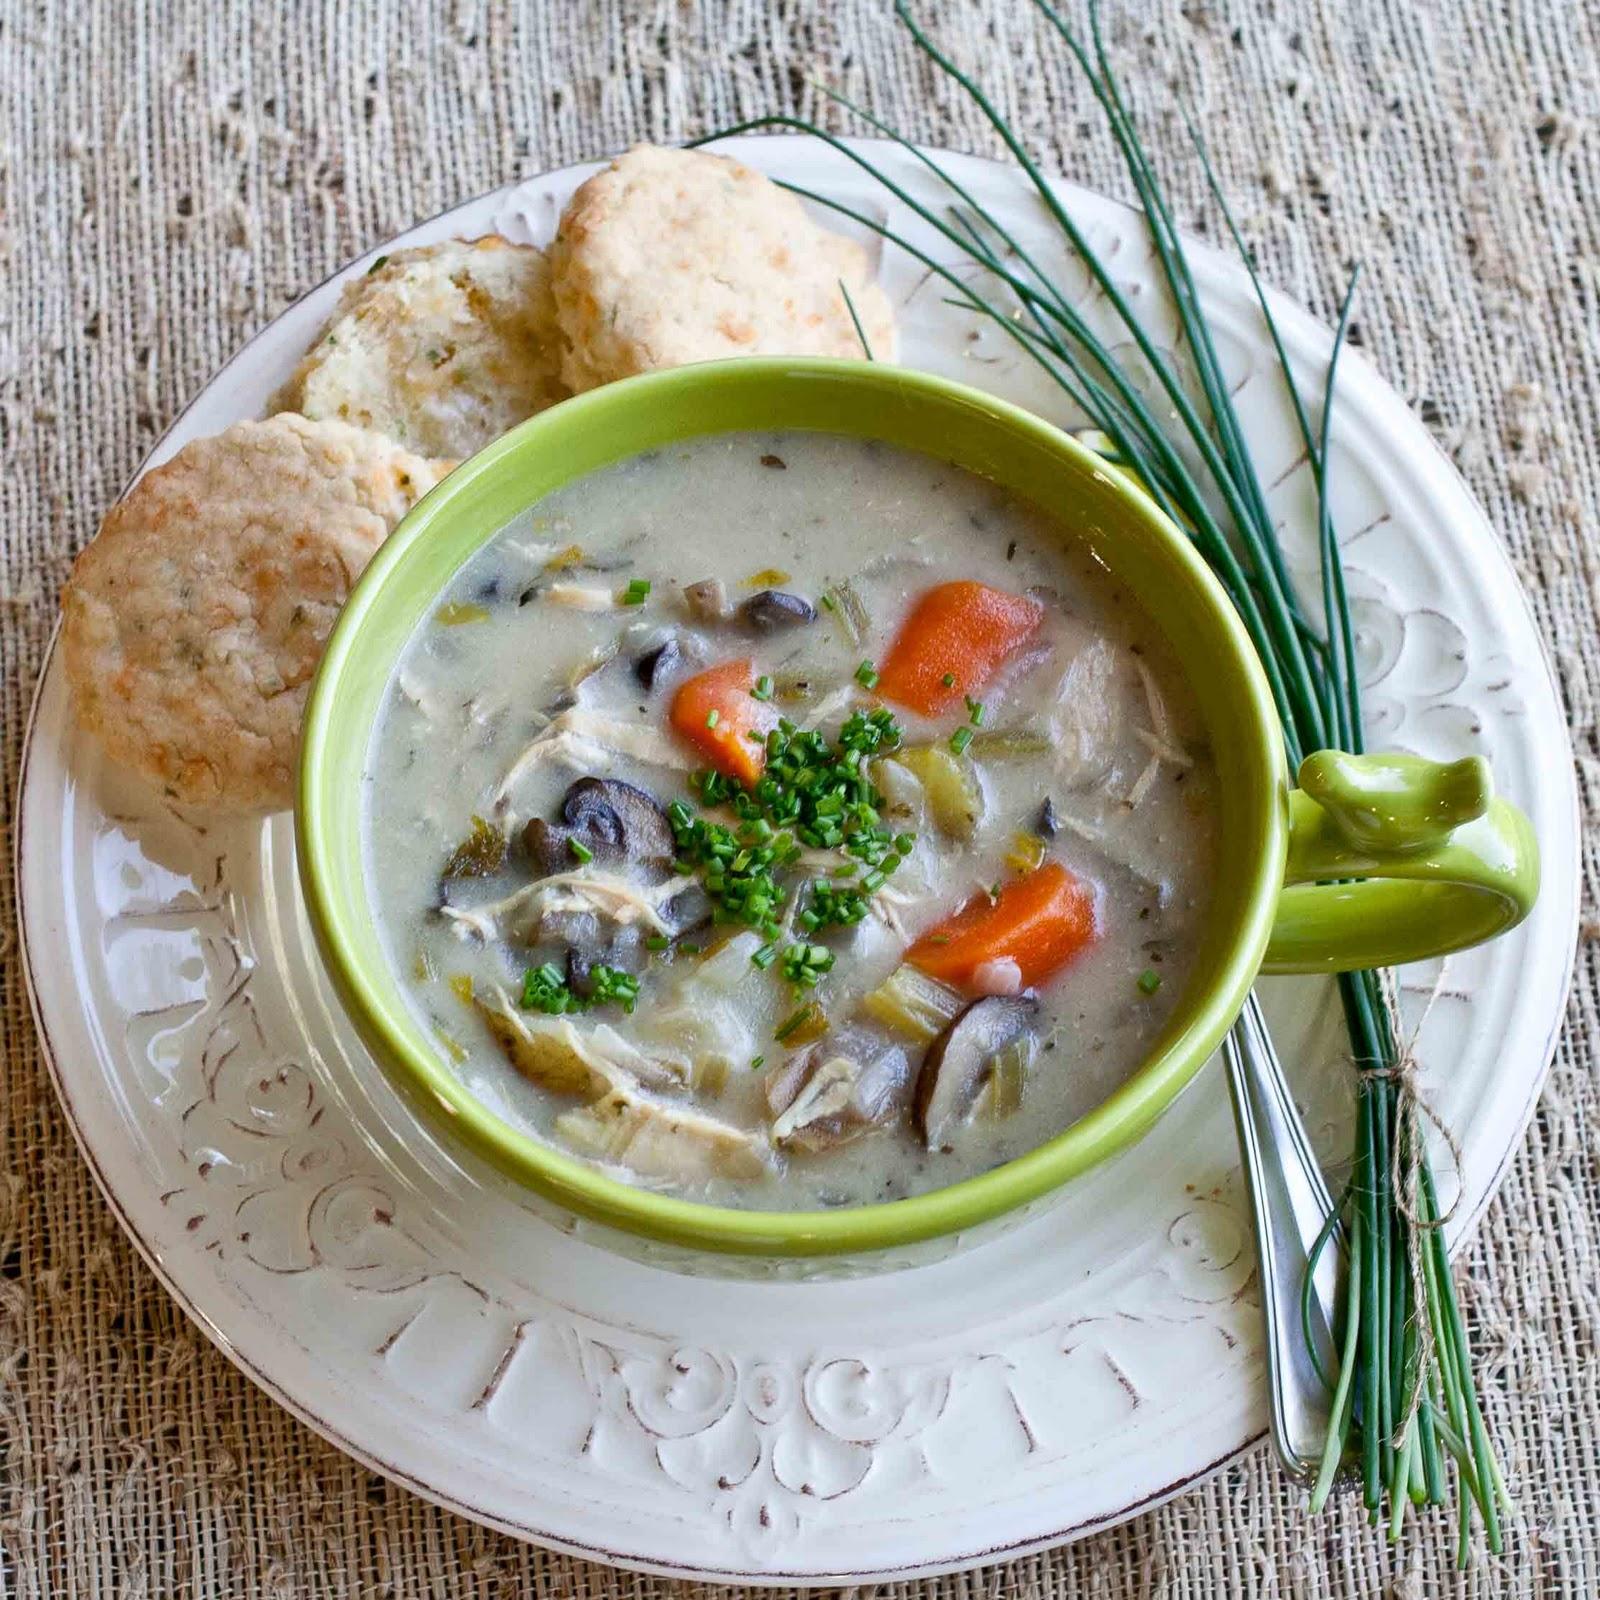 FOODjimoto: Creamy Chicken & Mushroom Stew